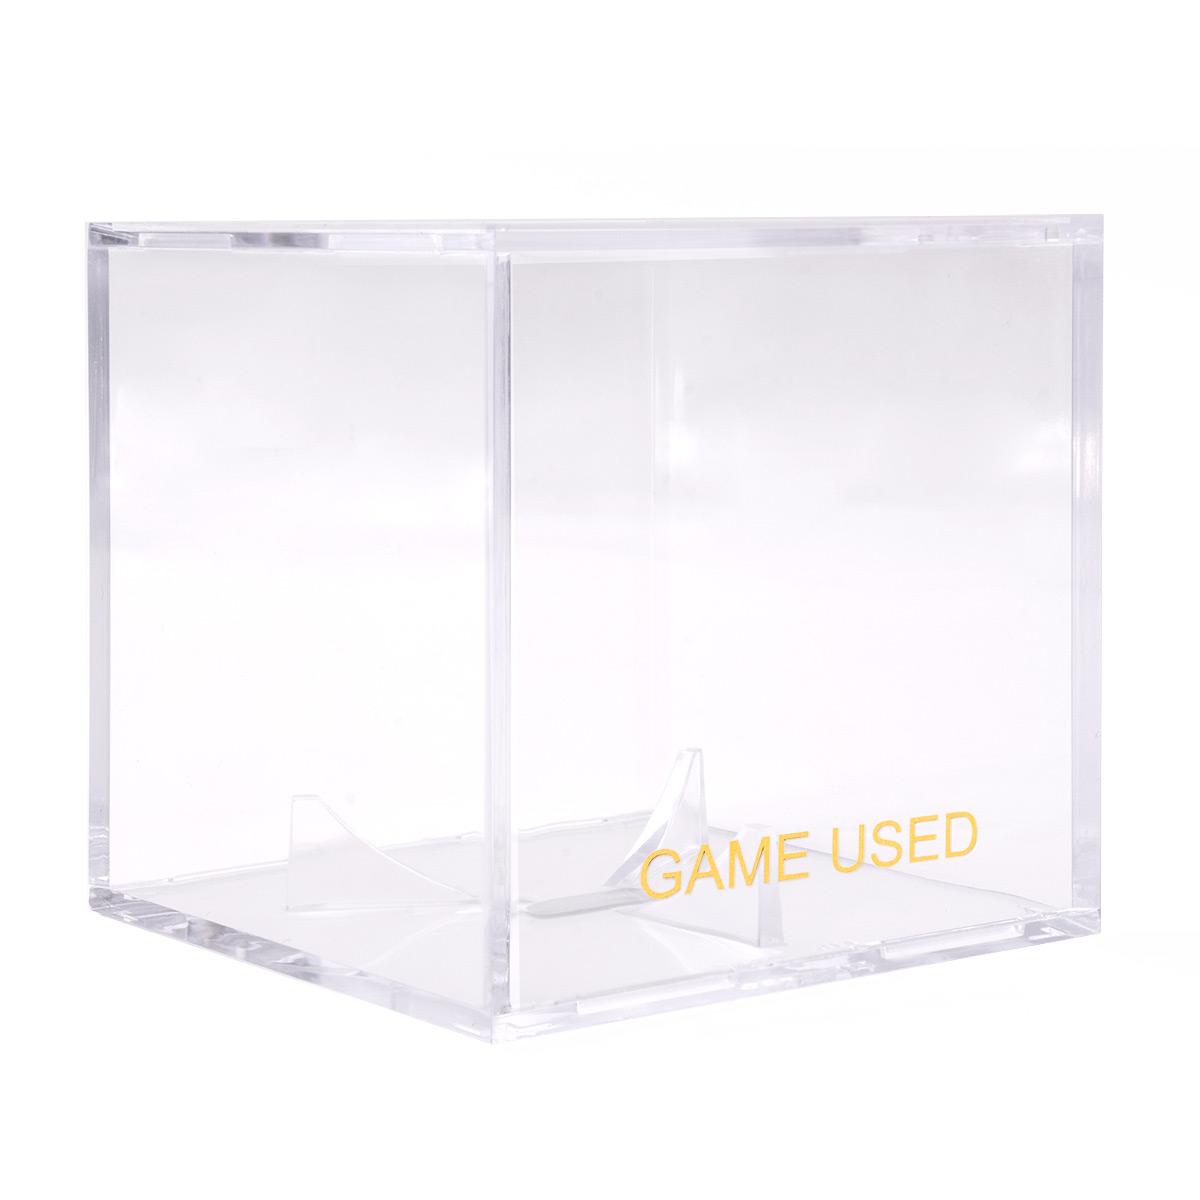 Game Used Baseball Clear Square Uv Holder